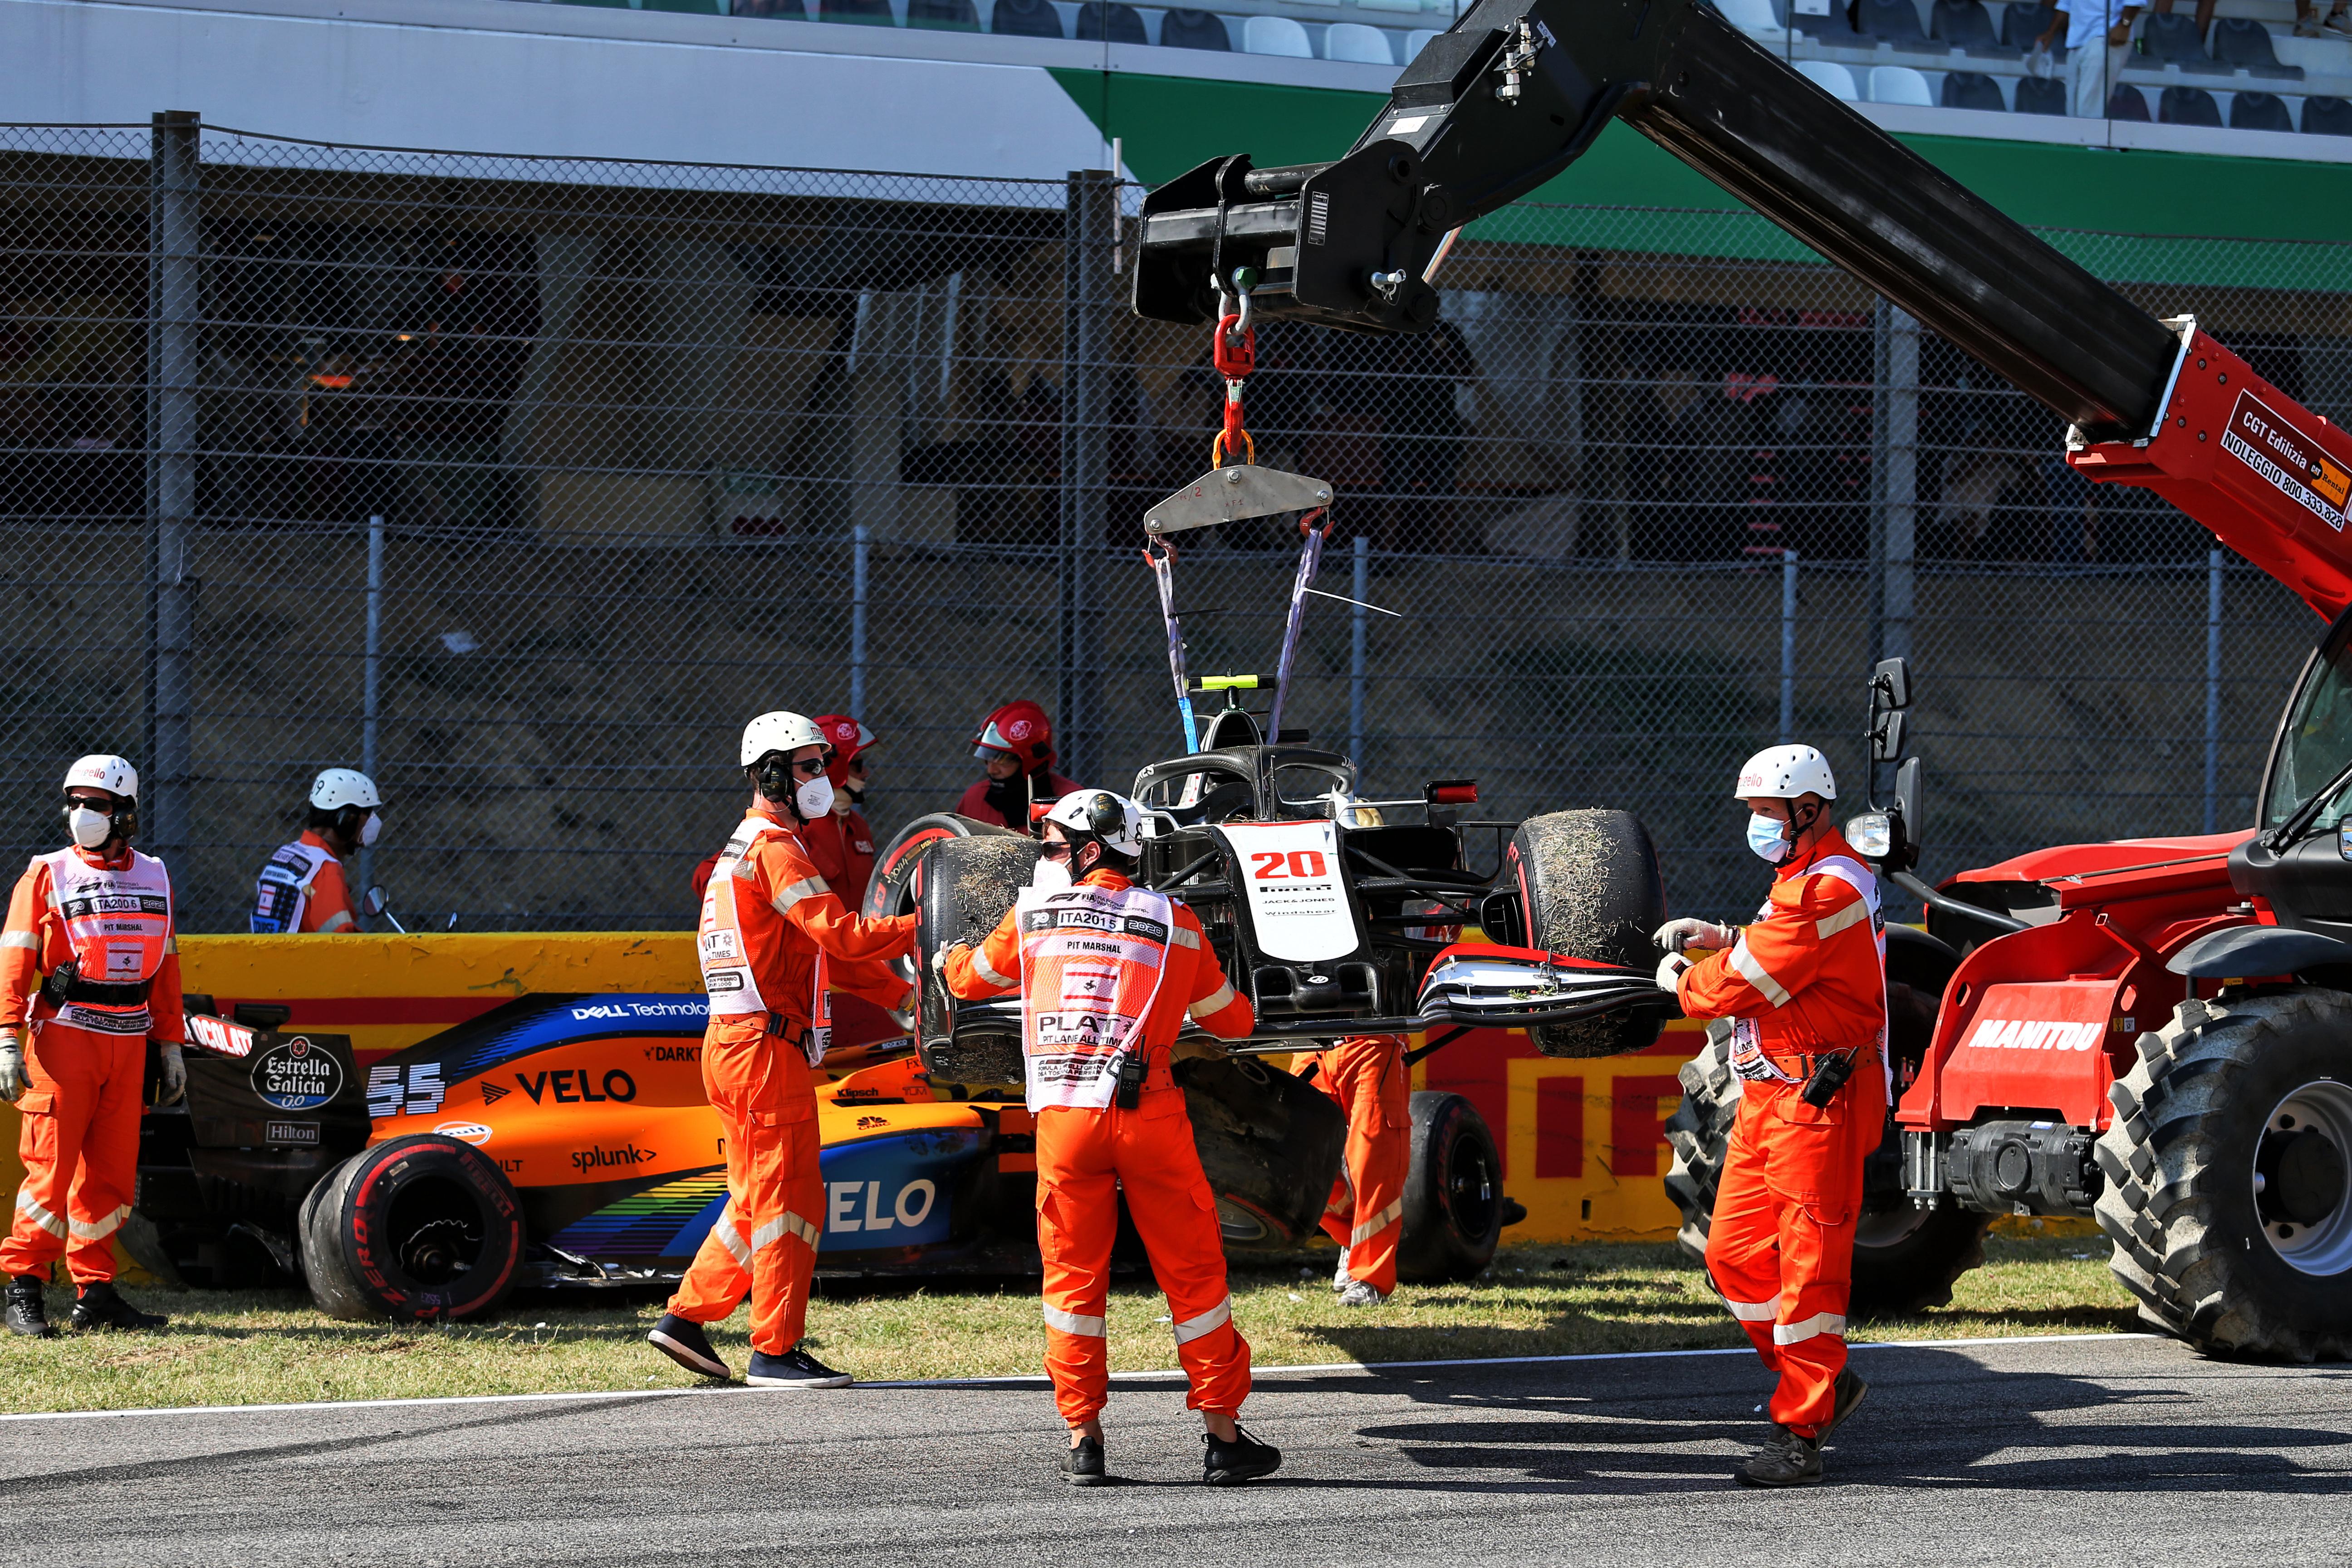 Motor Racing Formula One World Championship Tuscan Grand Prix Race Day Mugello, Italy